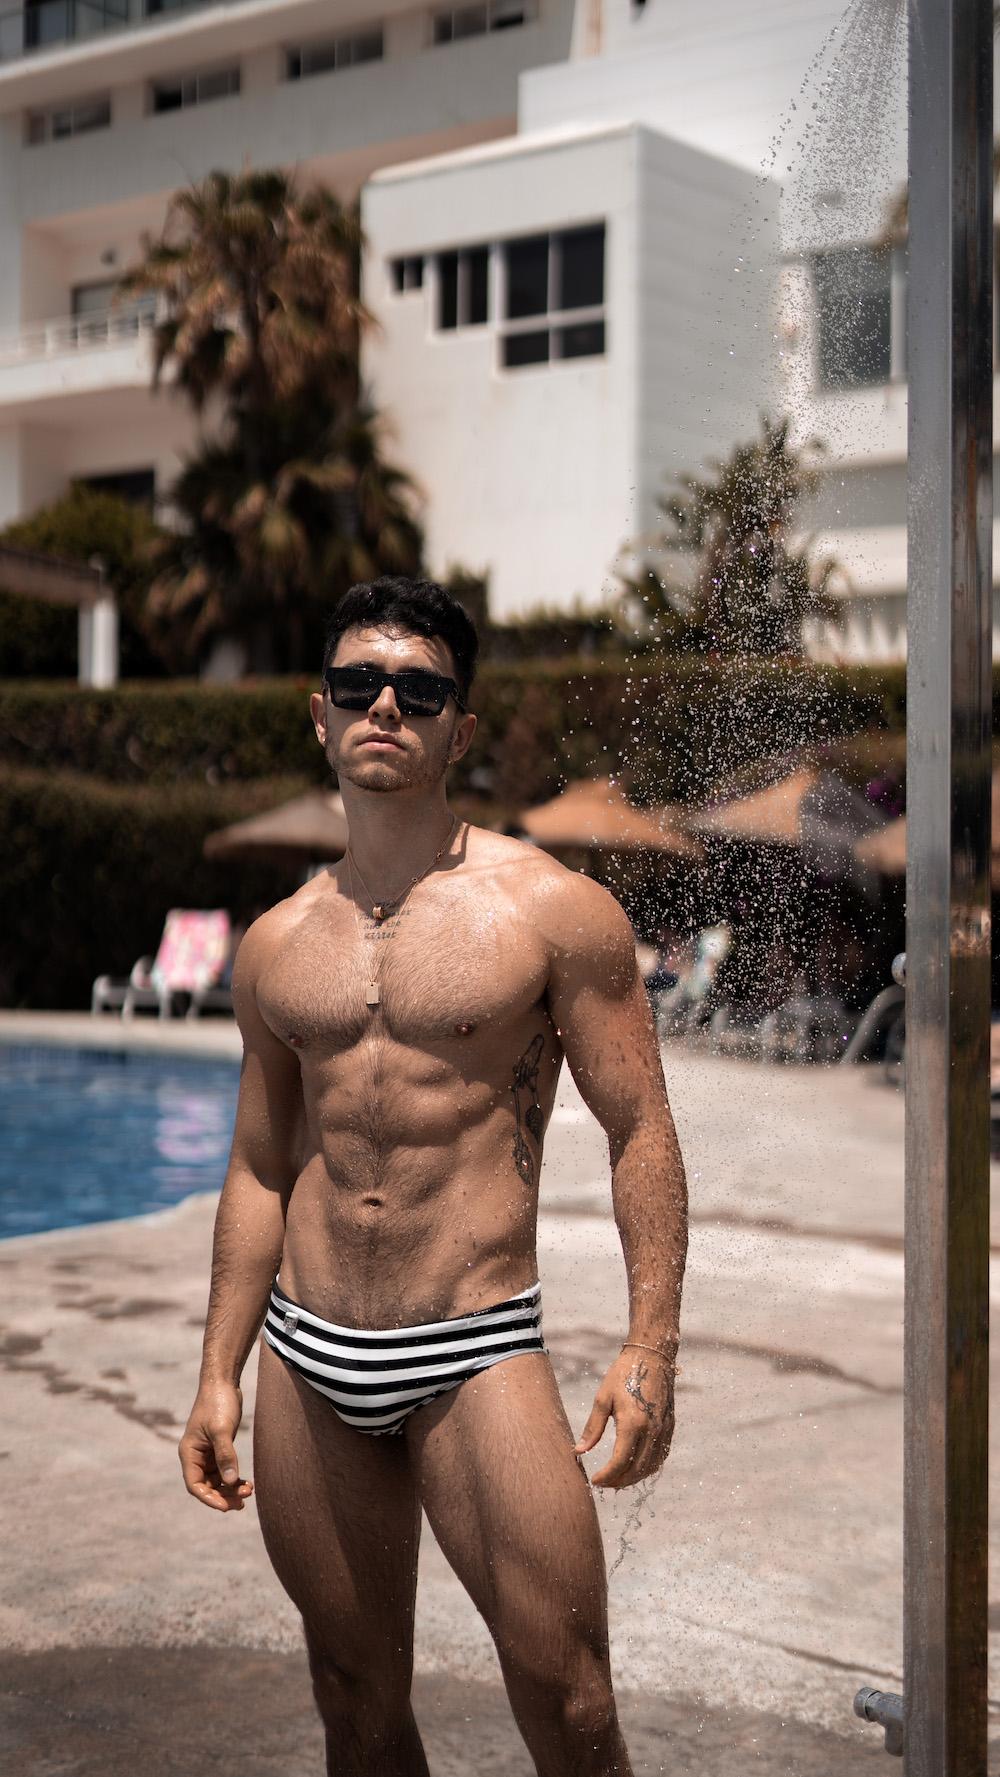 Model Alex photographed by Lawrence G. - Exodia swimwear